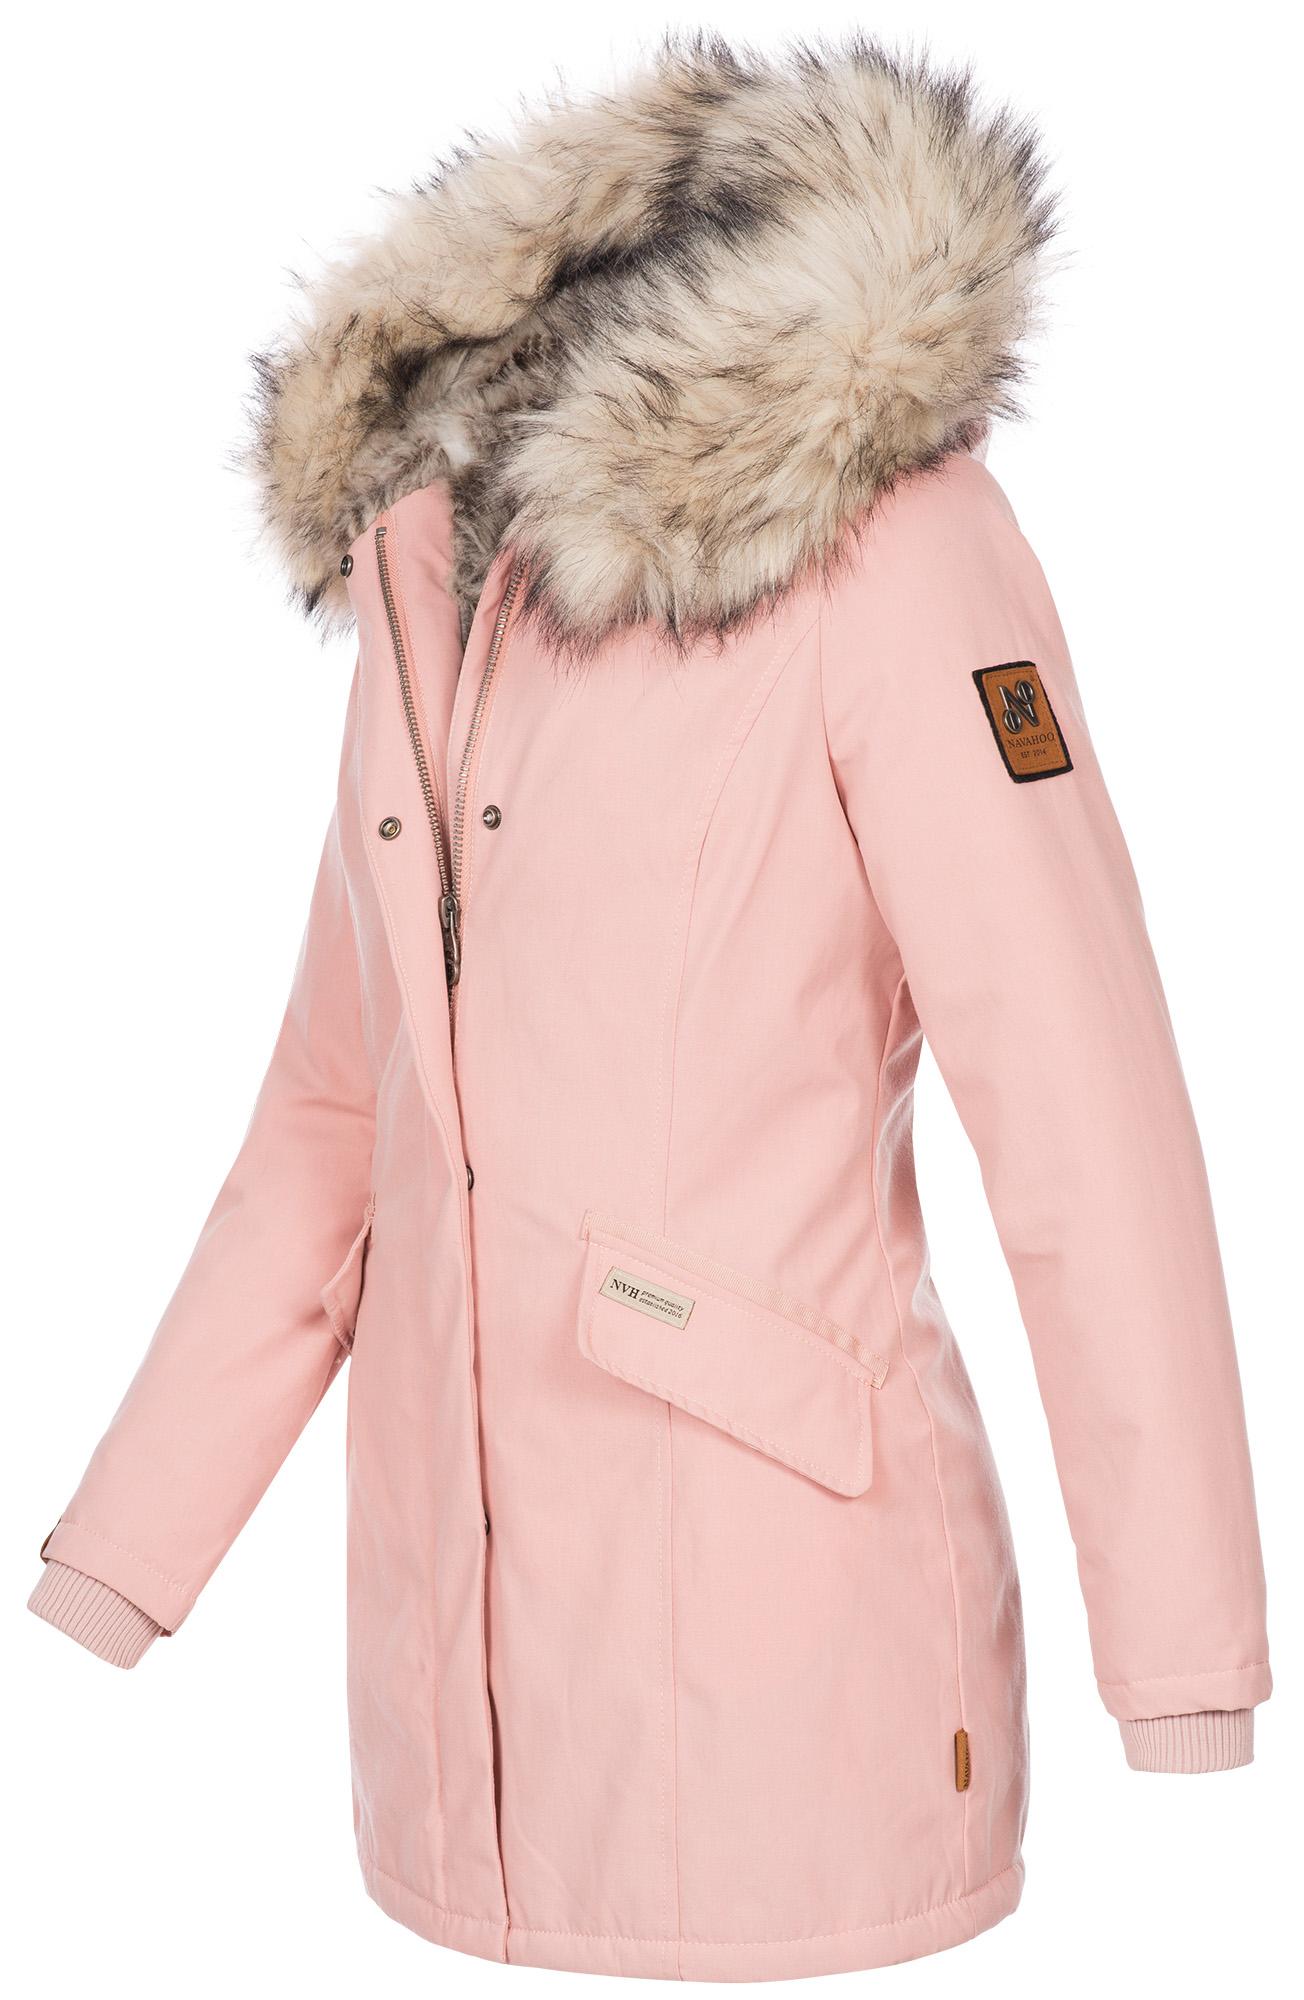 Navahoo-Premium-Damen-Winter-Jacke-Parka-Mantel-Winterjacke-warm-Kunstfell-B669 Indexbild 17